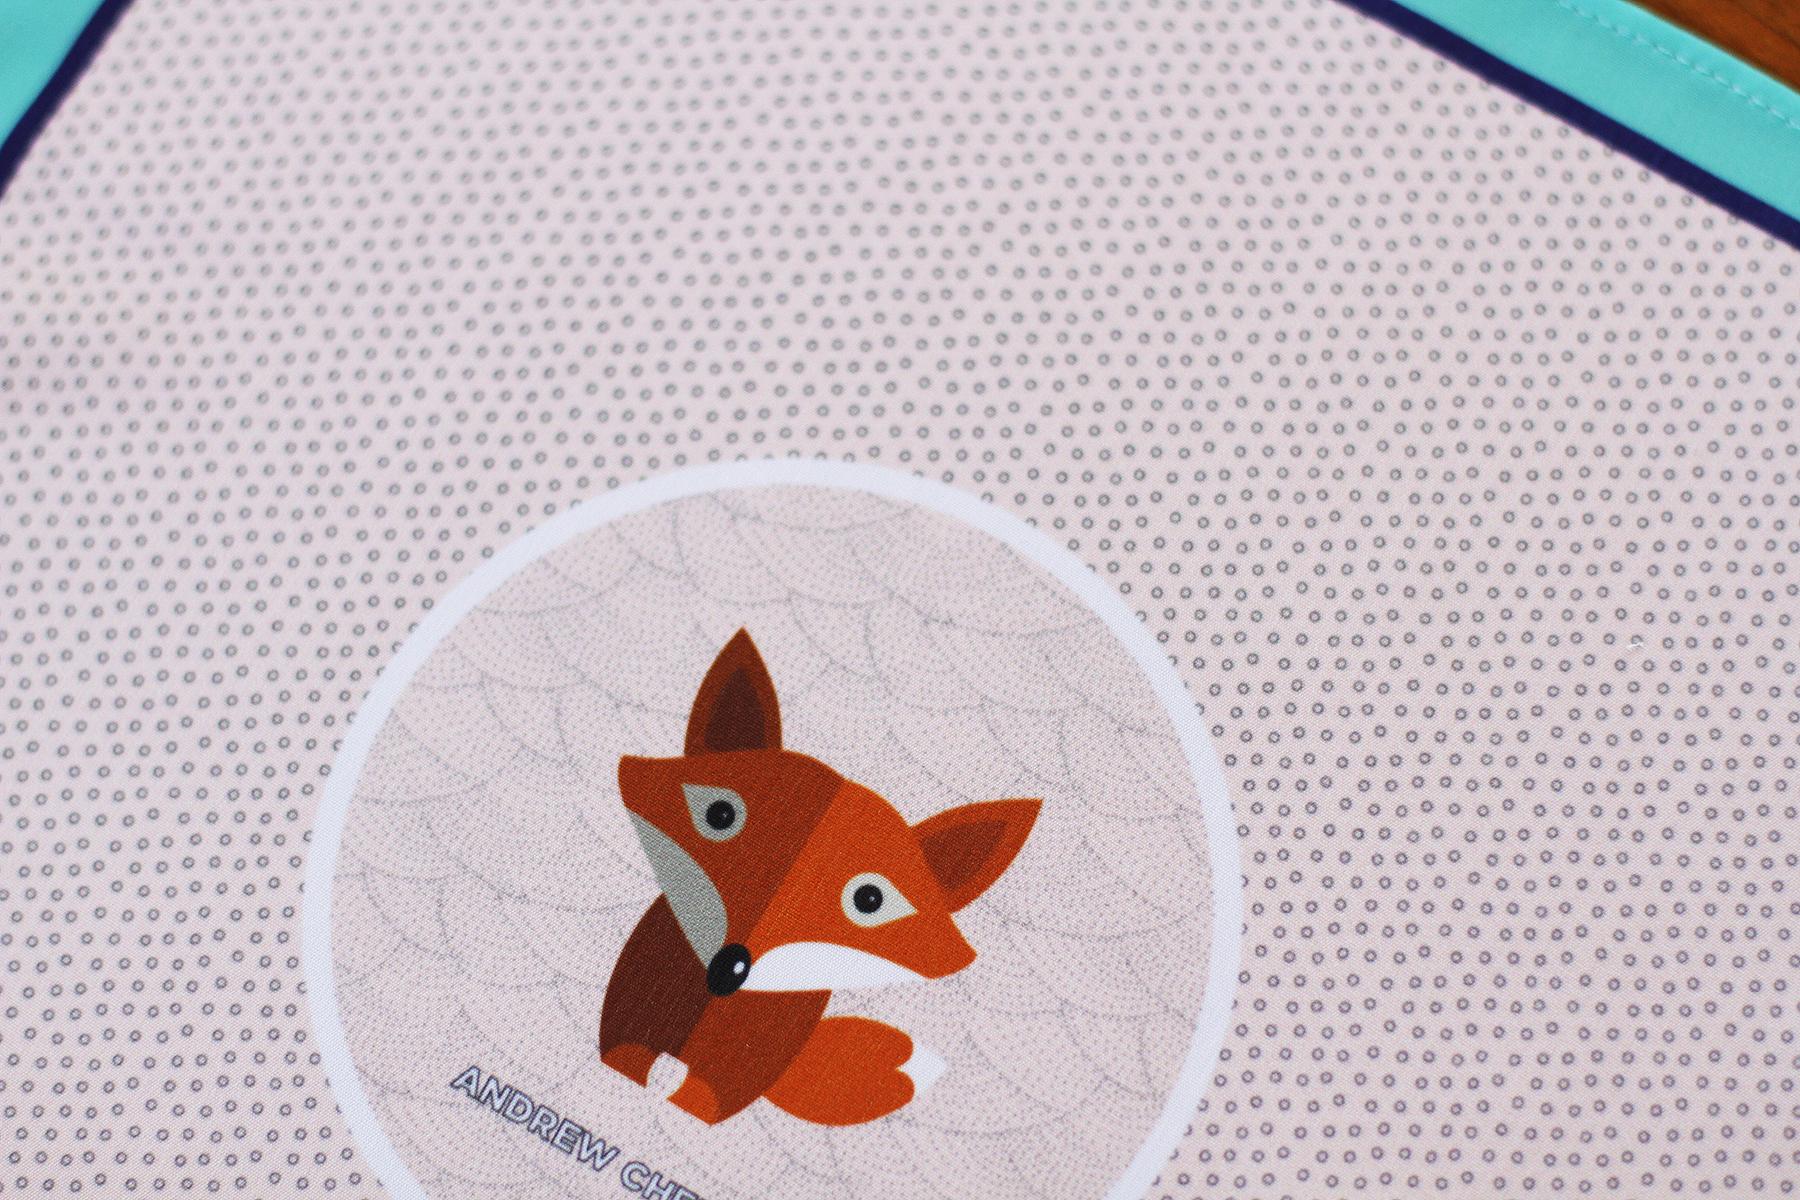 Pocket Square Clothing Custom Printed Fabric